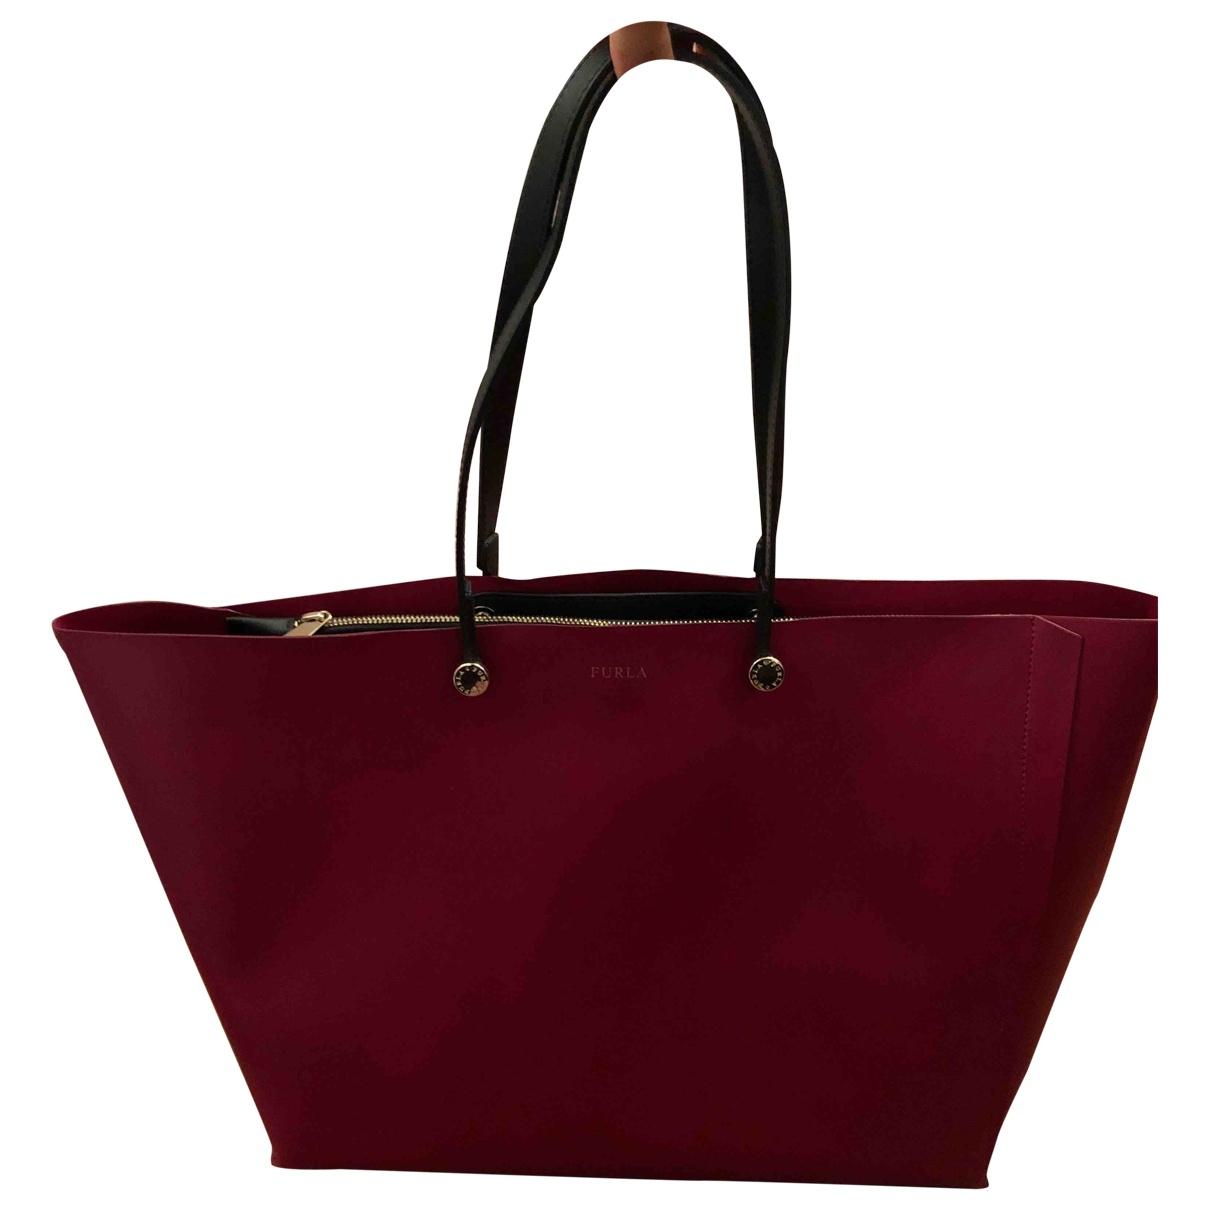 Furla \N Burgundy Leather handbag for Women \N